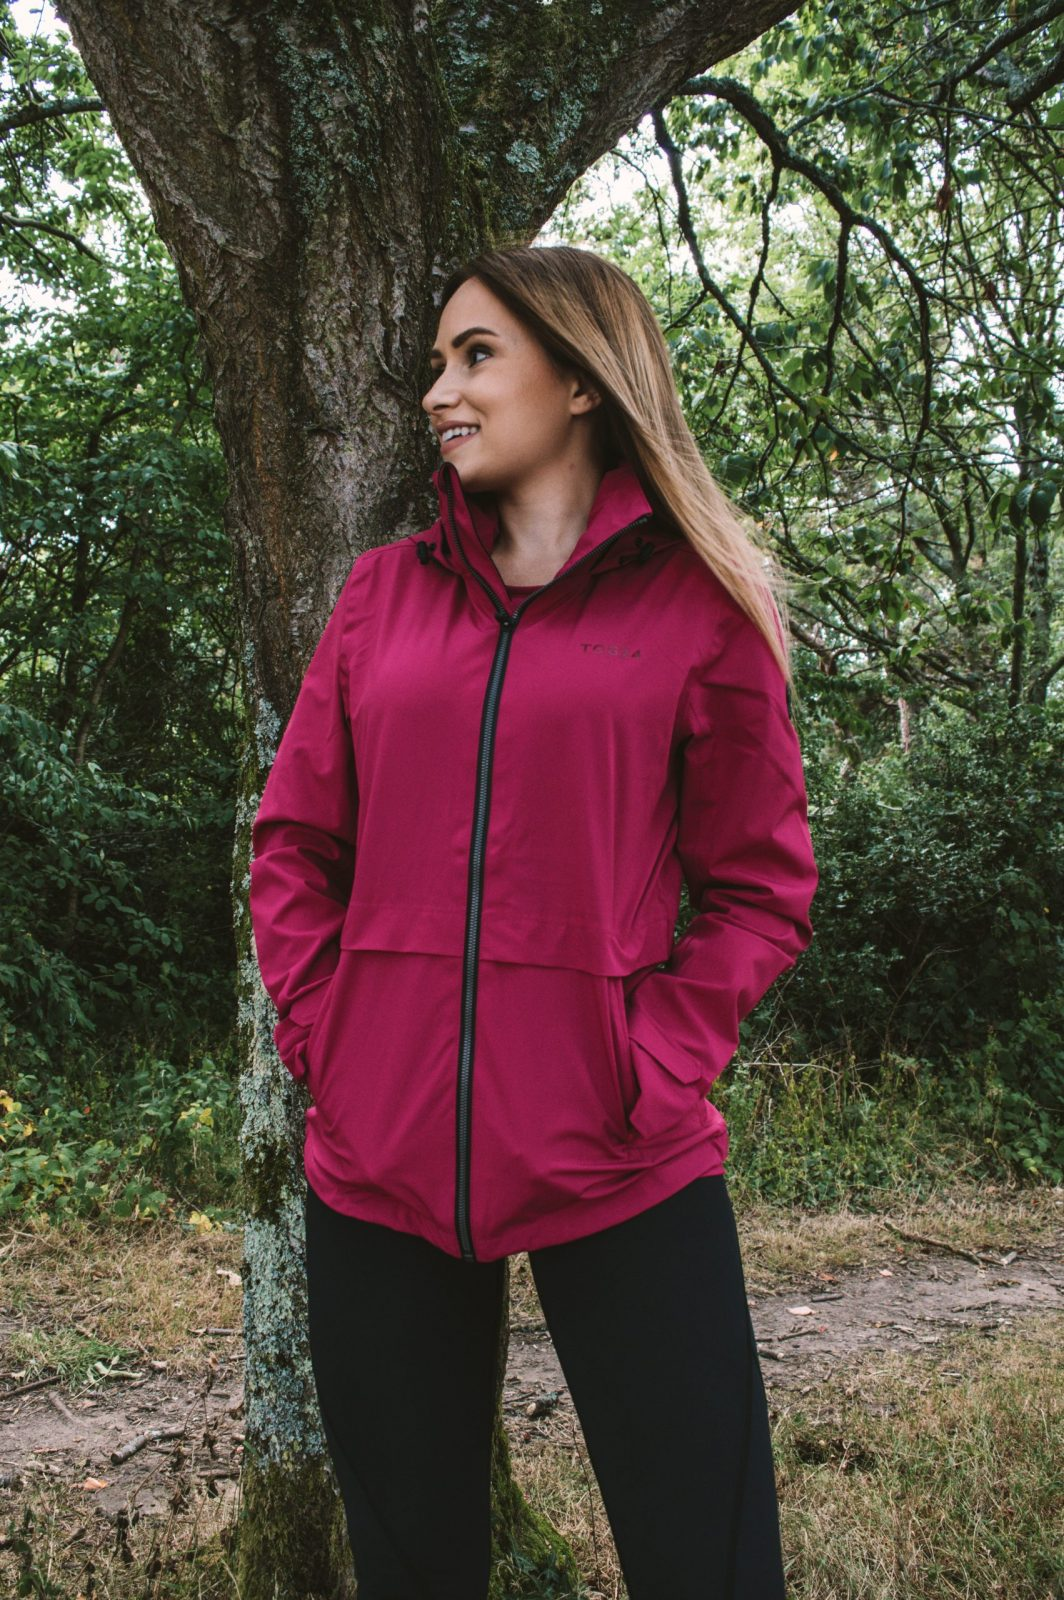 TOG 24 Activewear jacket